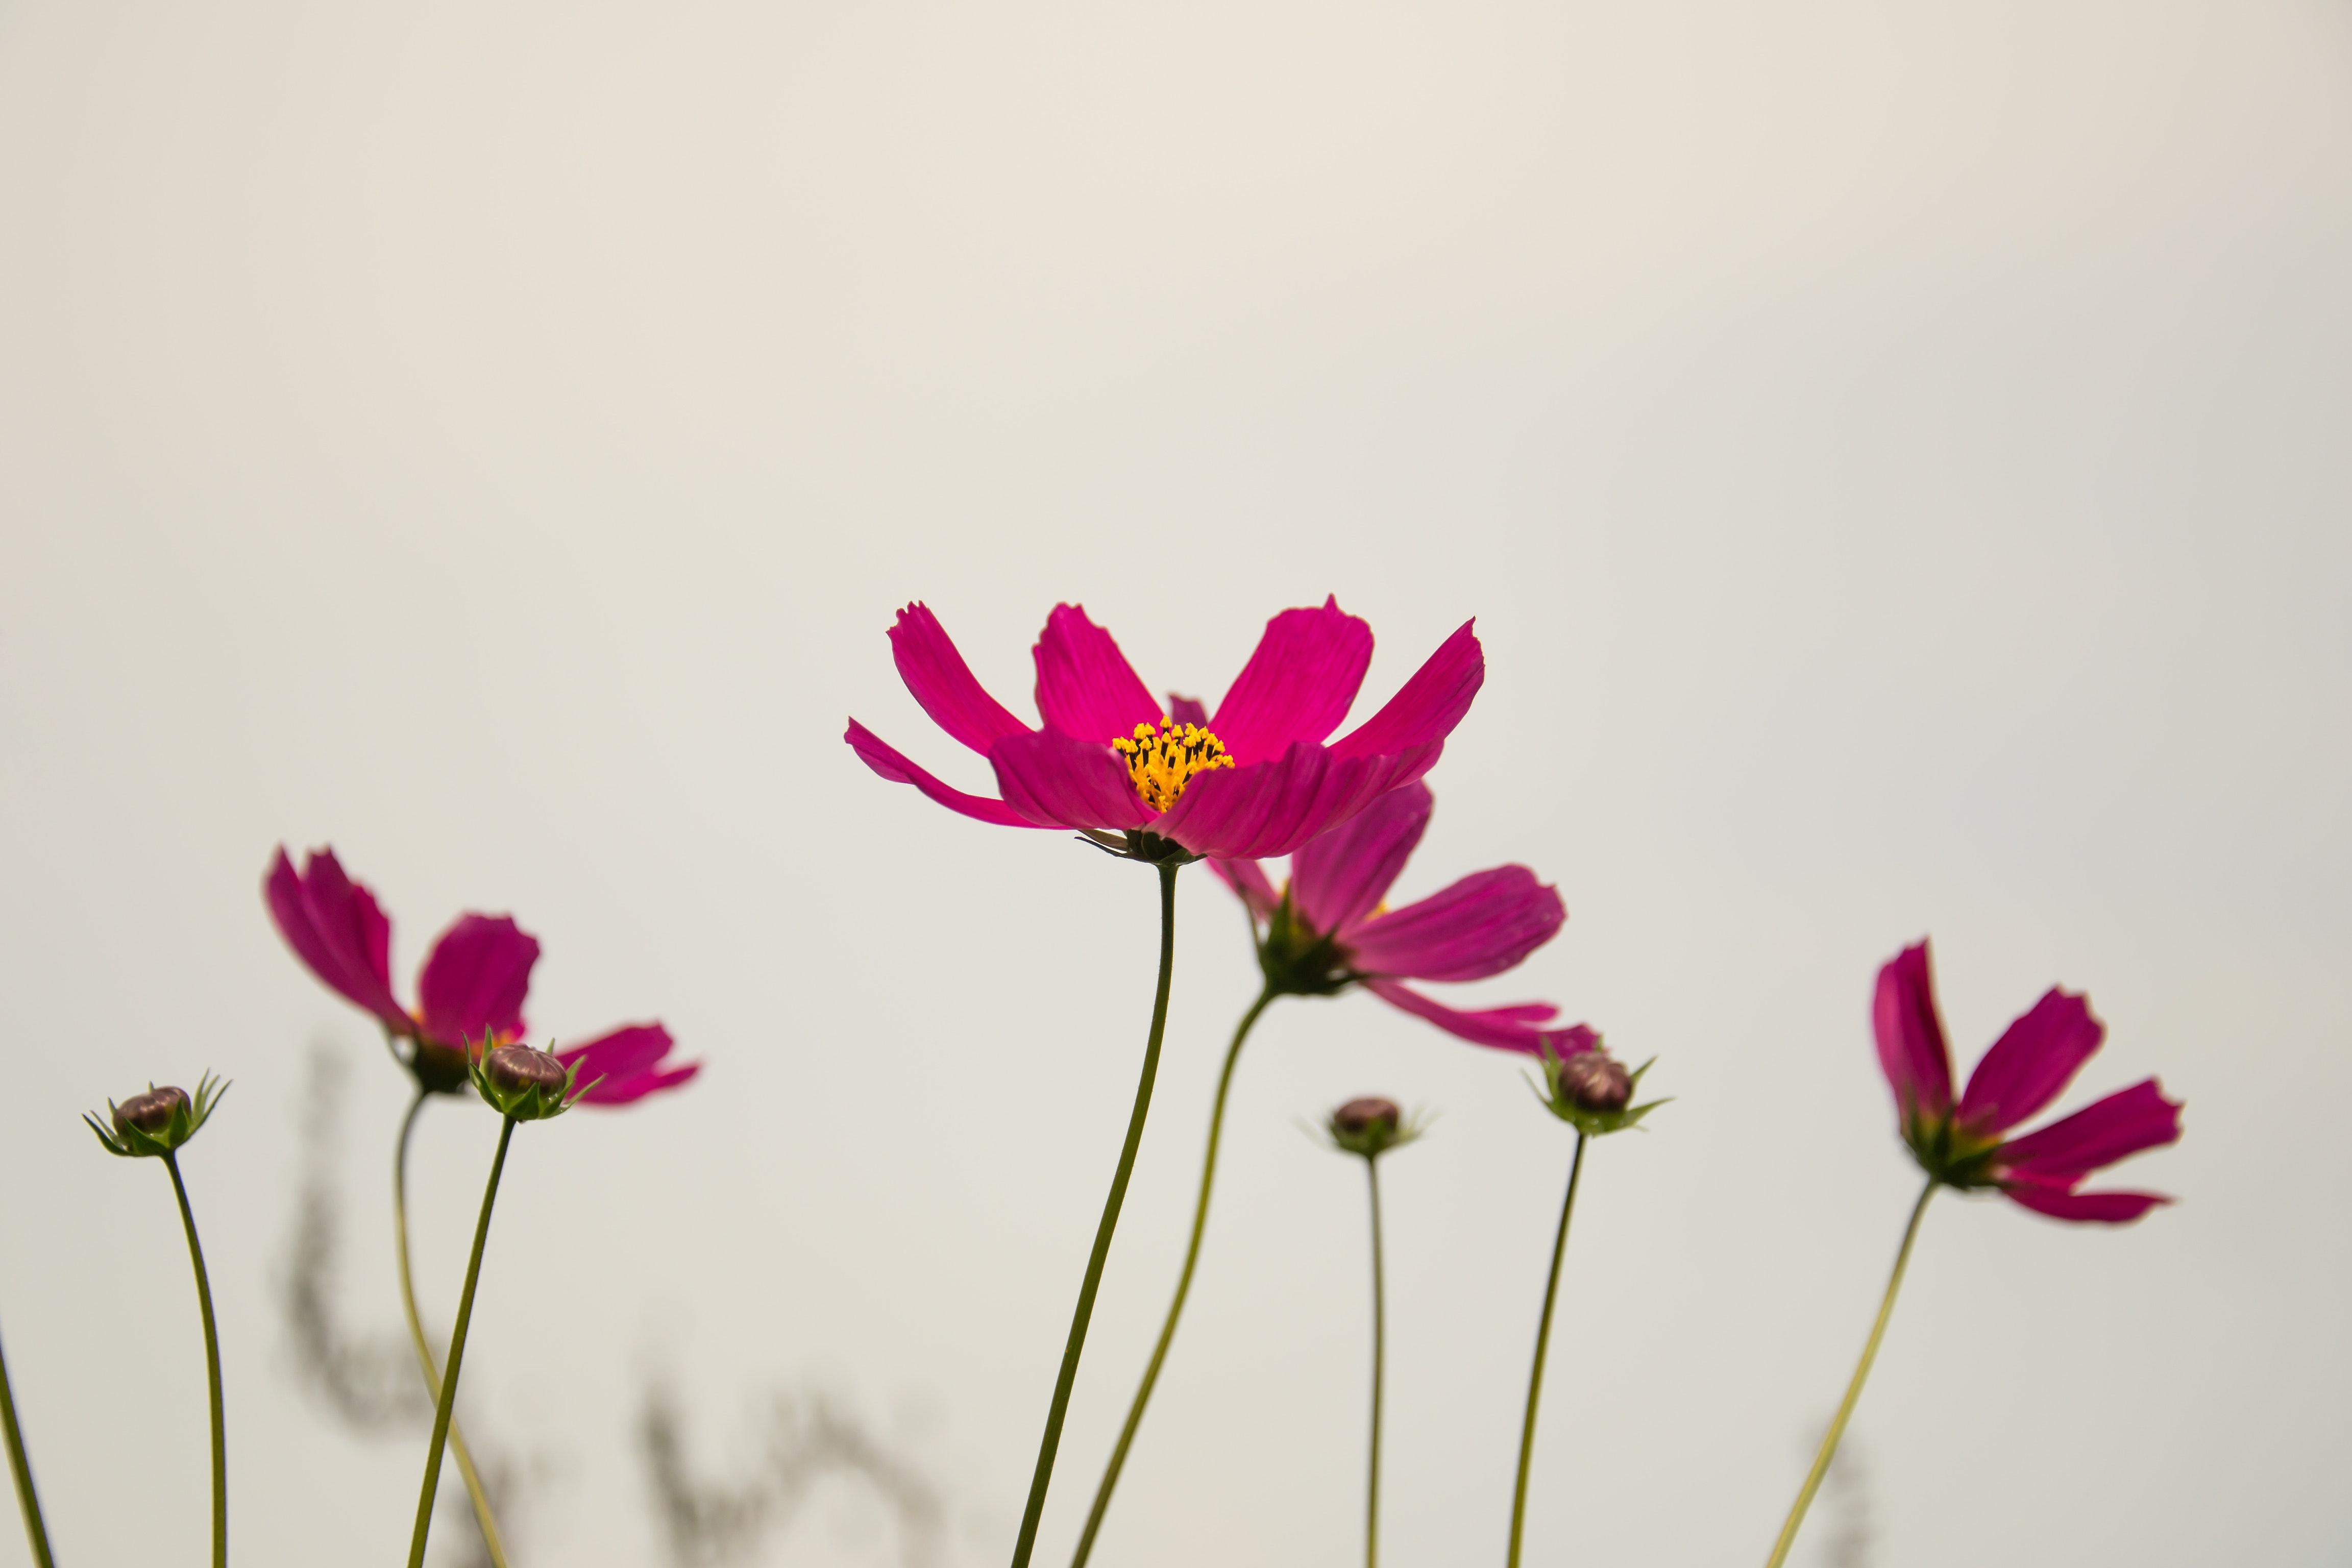 Free Images : bloom, blossom, flora, flowers, hd wallpaper, petal